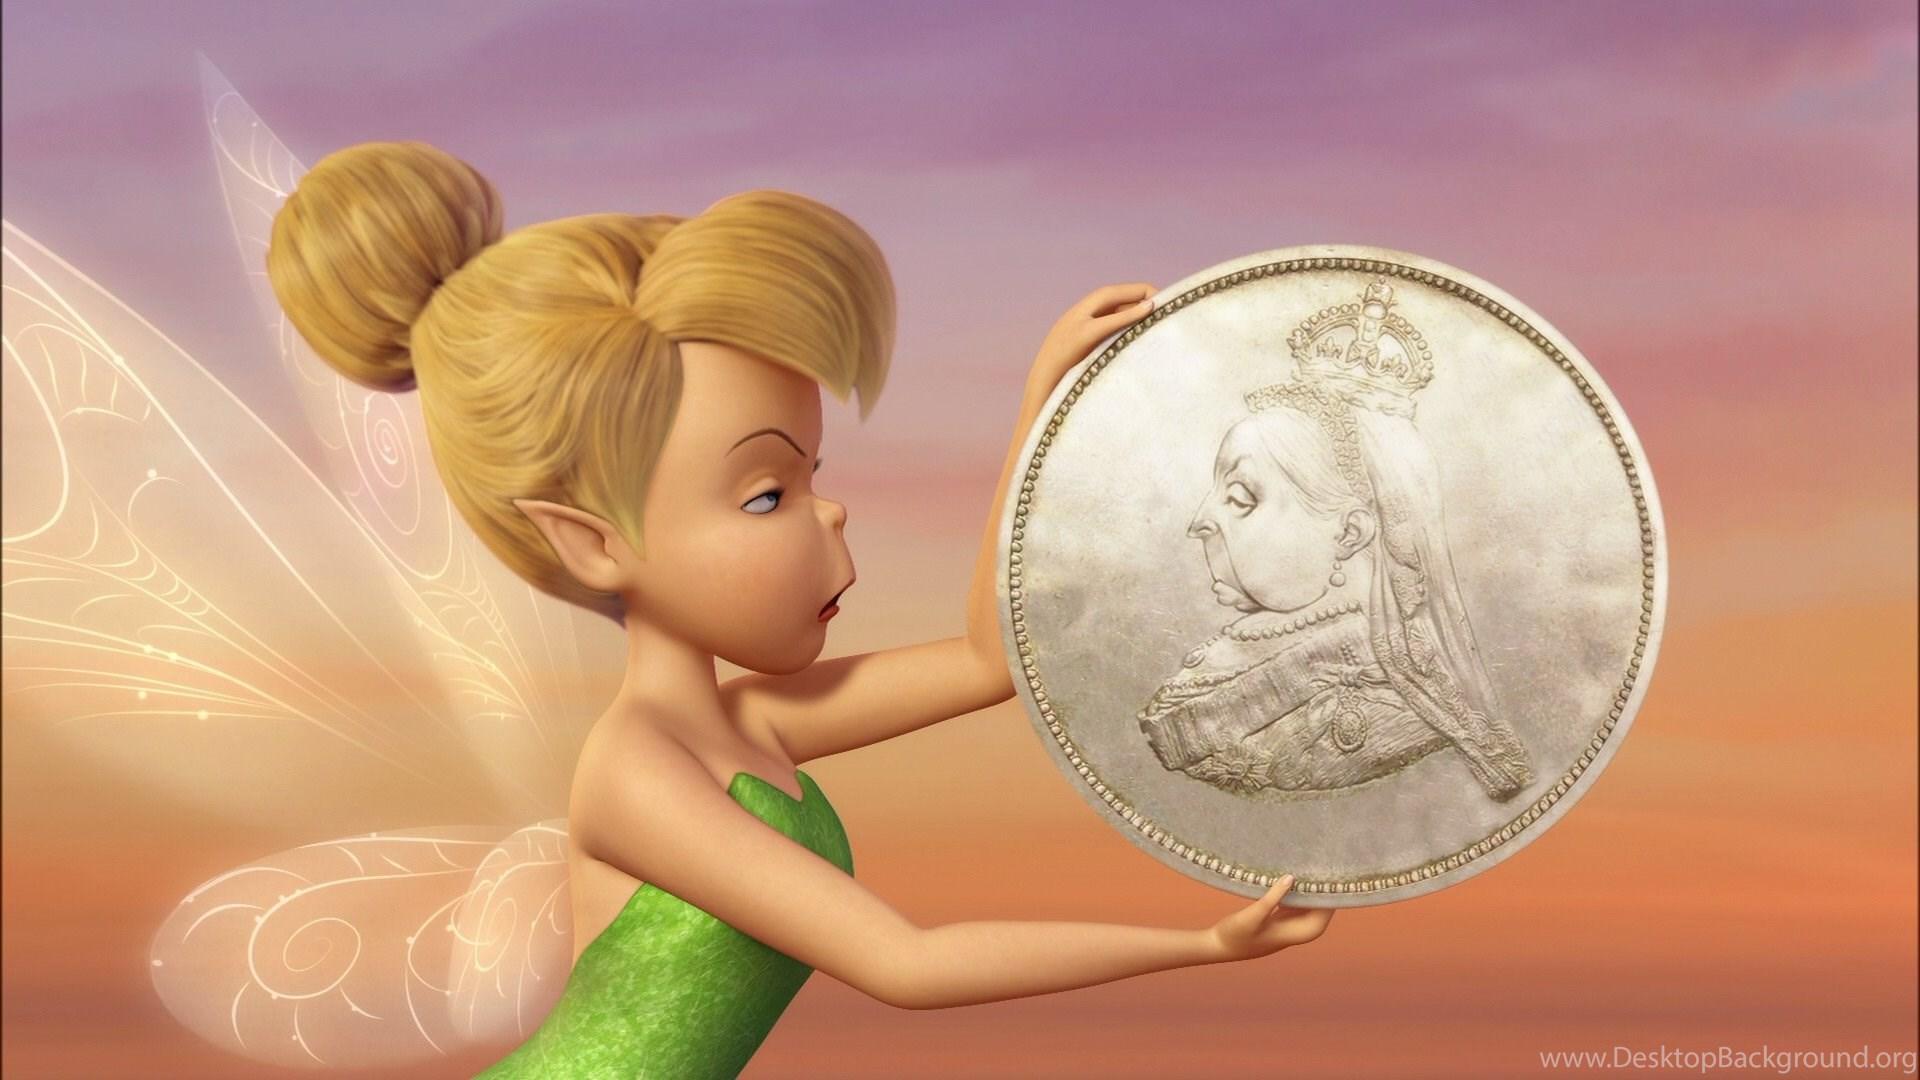 HD Tinkerbell Disney Fairy Desktop Wallpapers HD 1080p Full Size